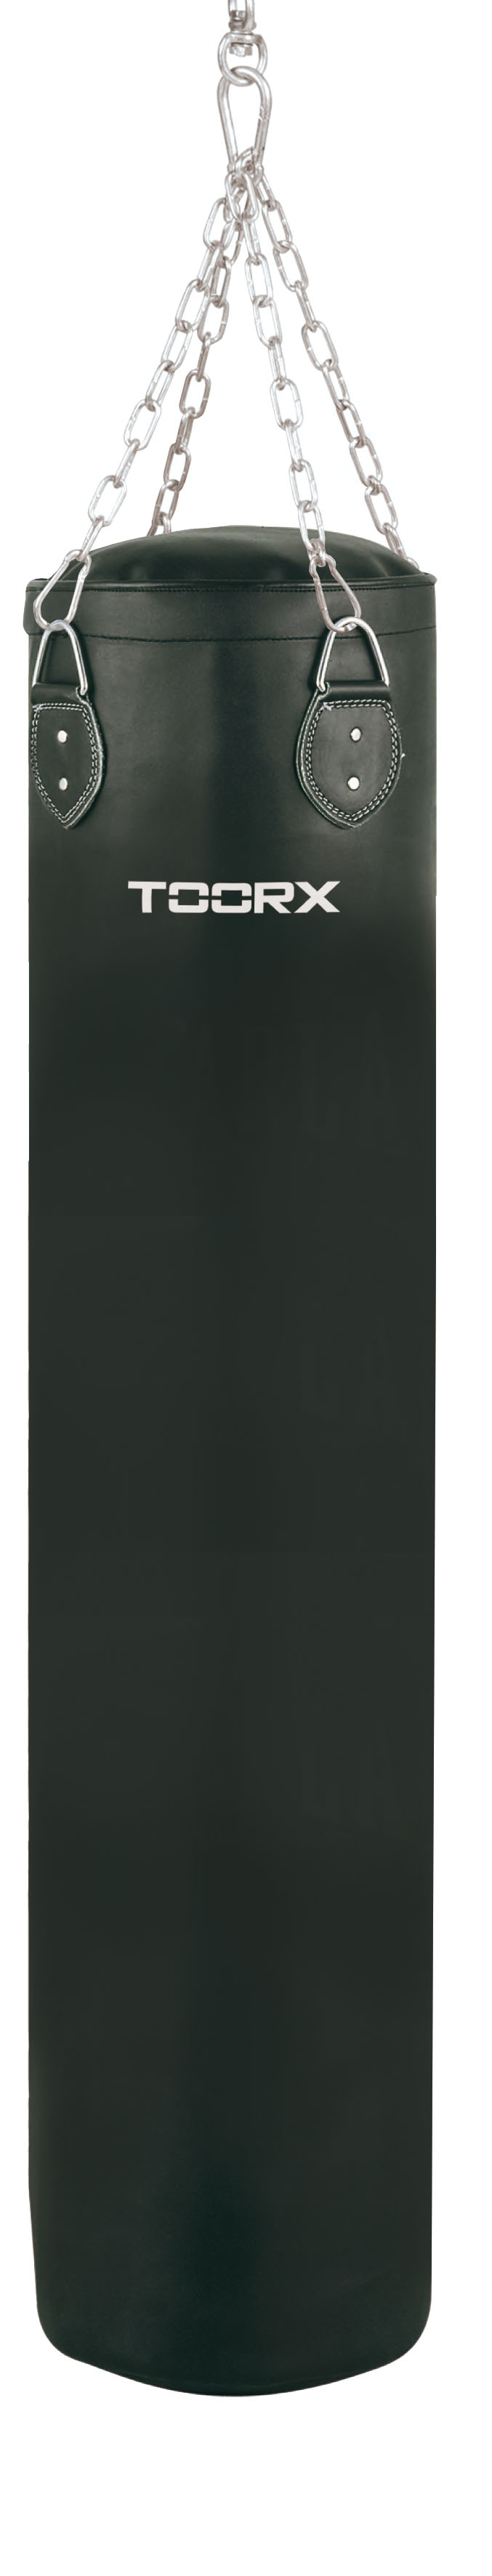 Sac box Toorx 130 cm